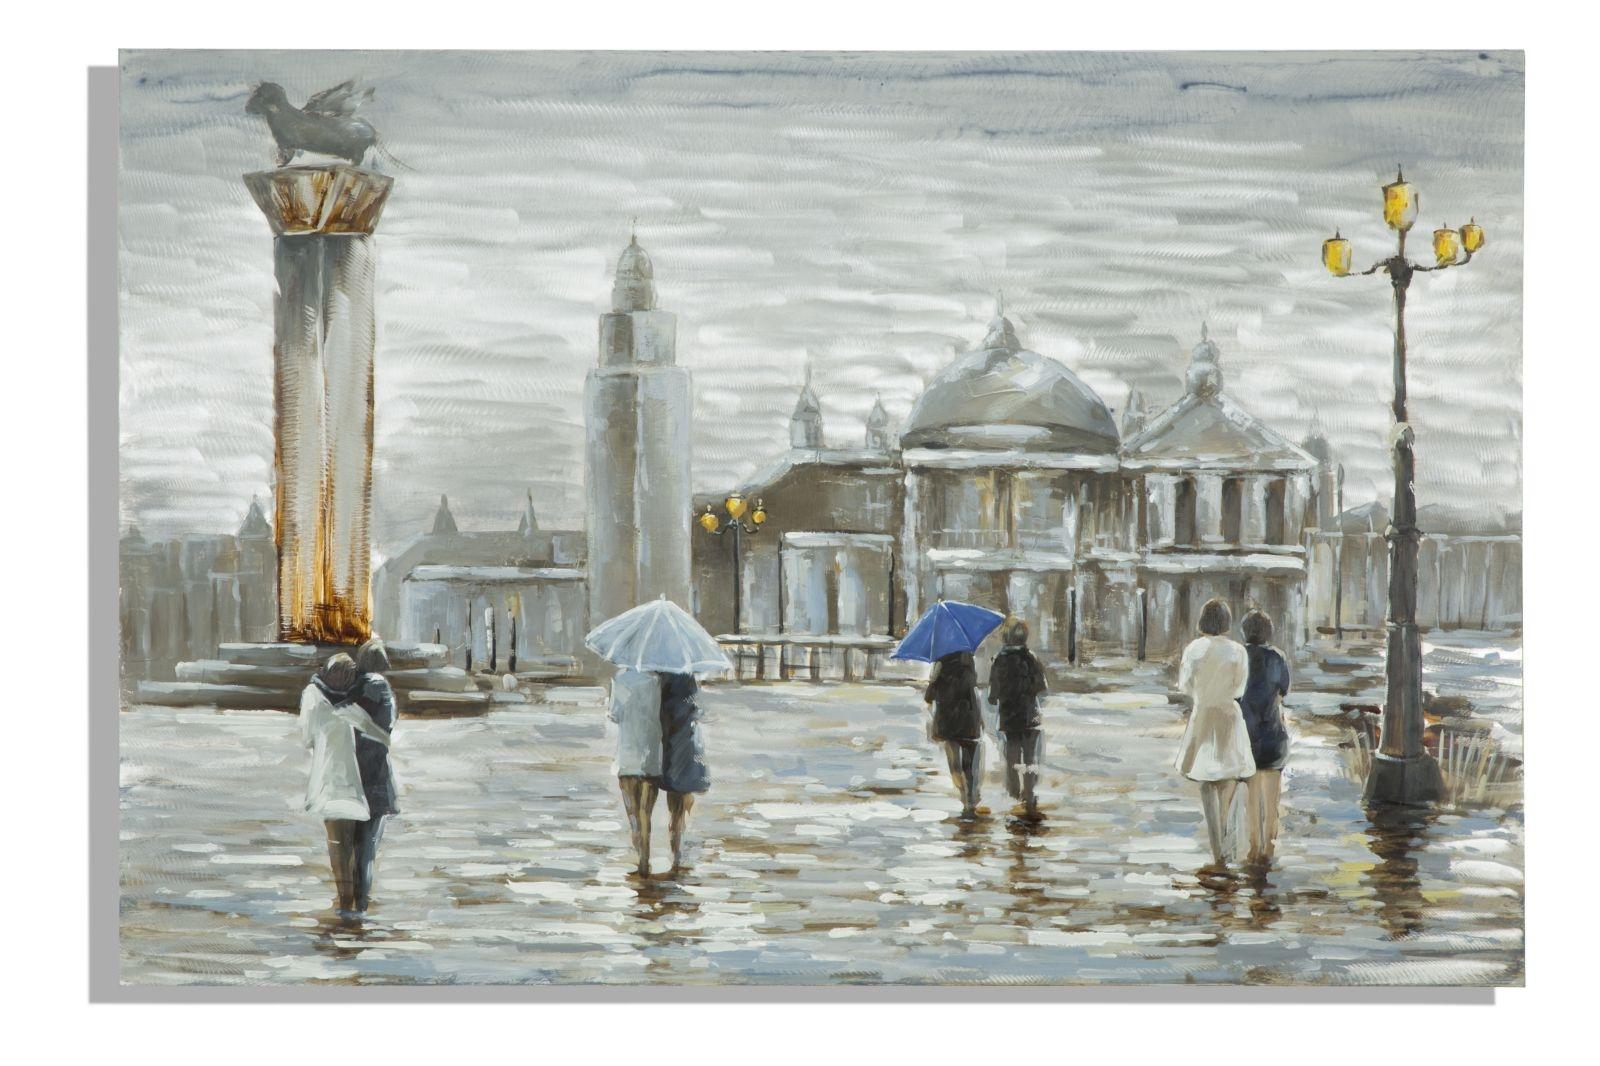 Tablou pictat manual Old City, 120×80 cm